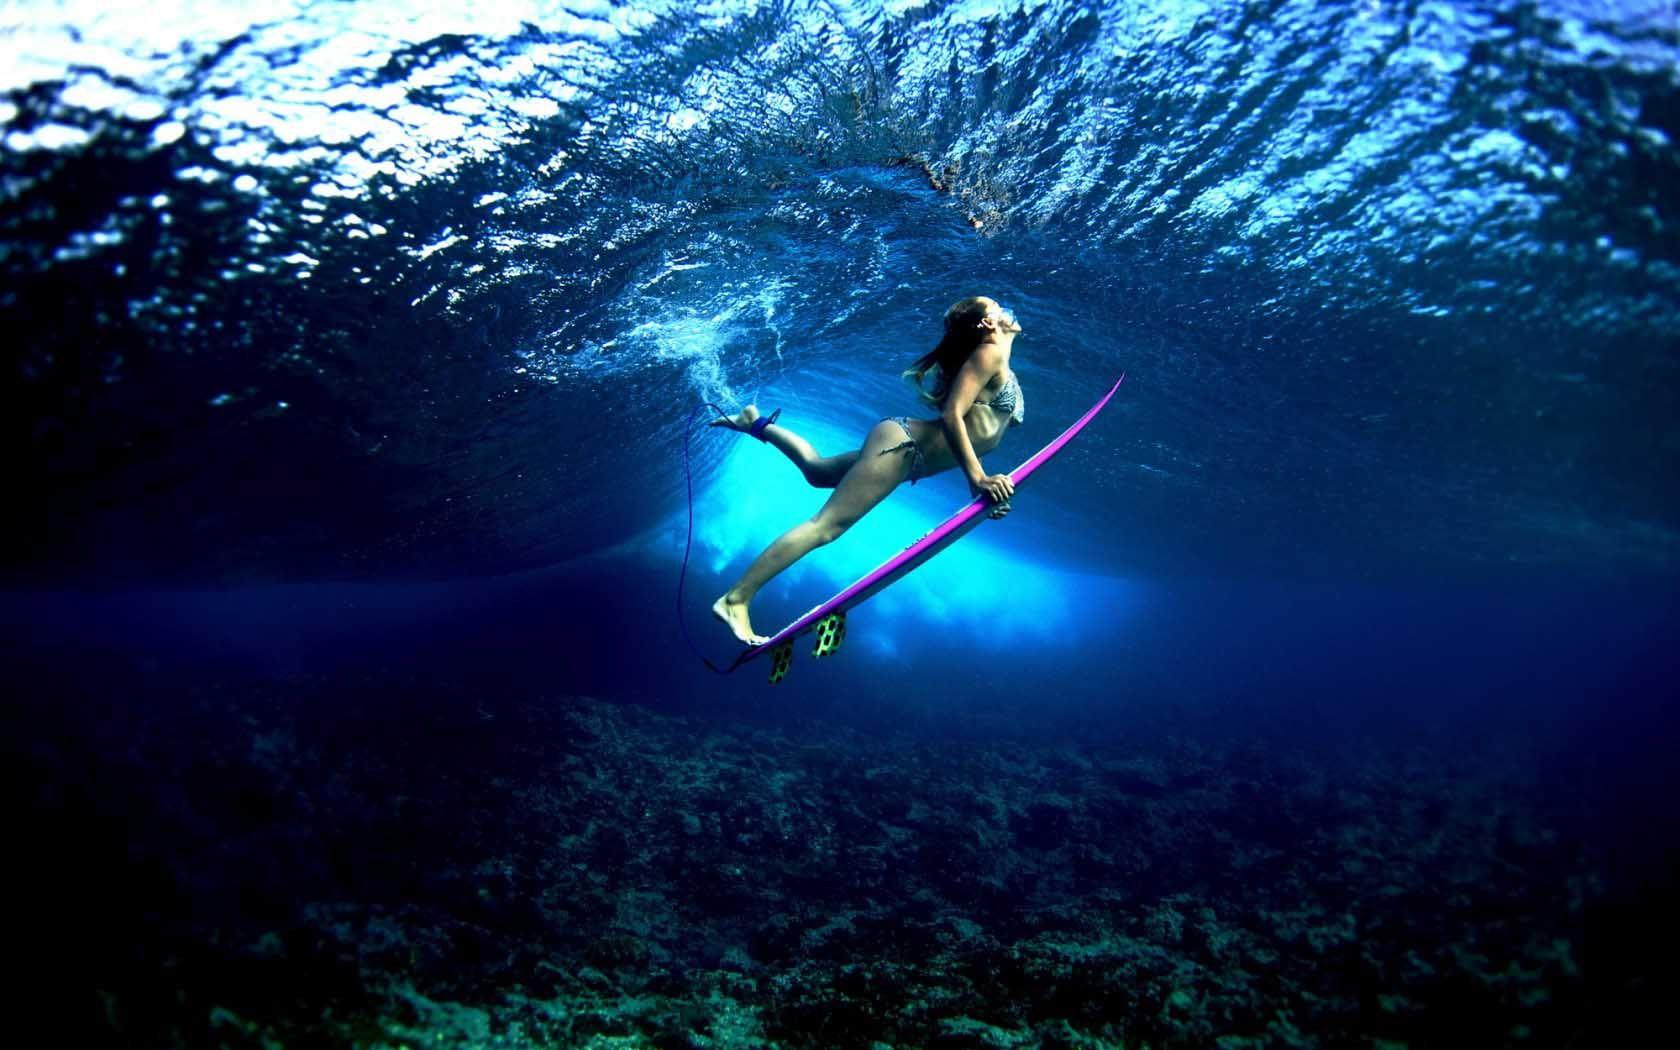 surfing girl hd wallpaper 4 whb #surfinggirlhdwallpaper #surfinggirl